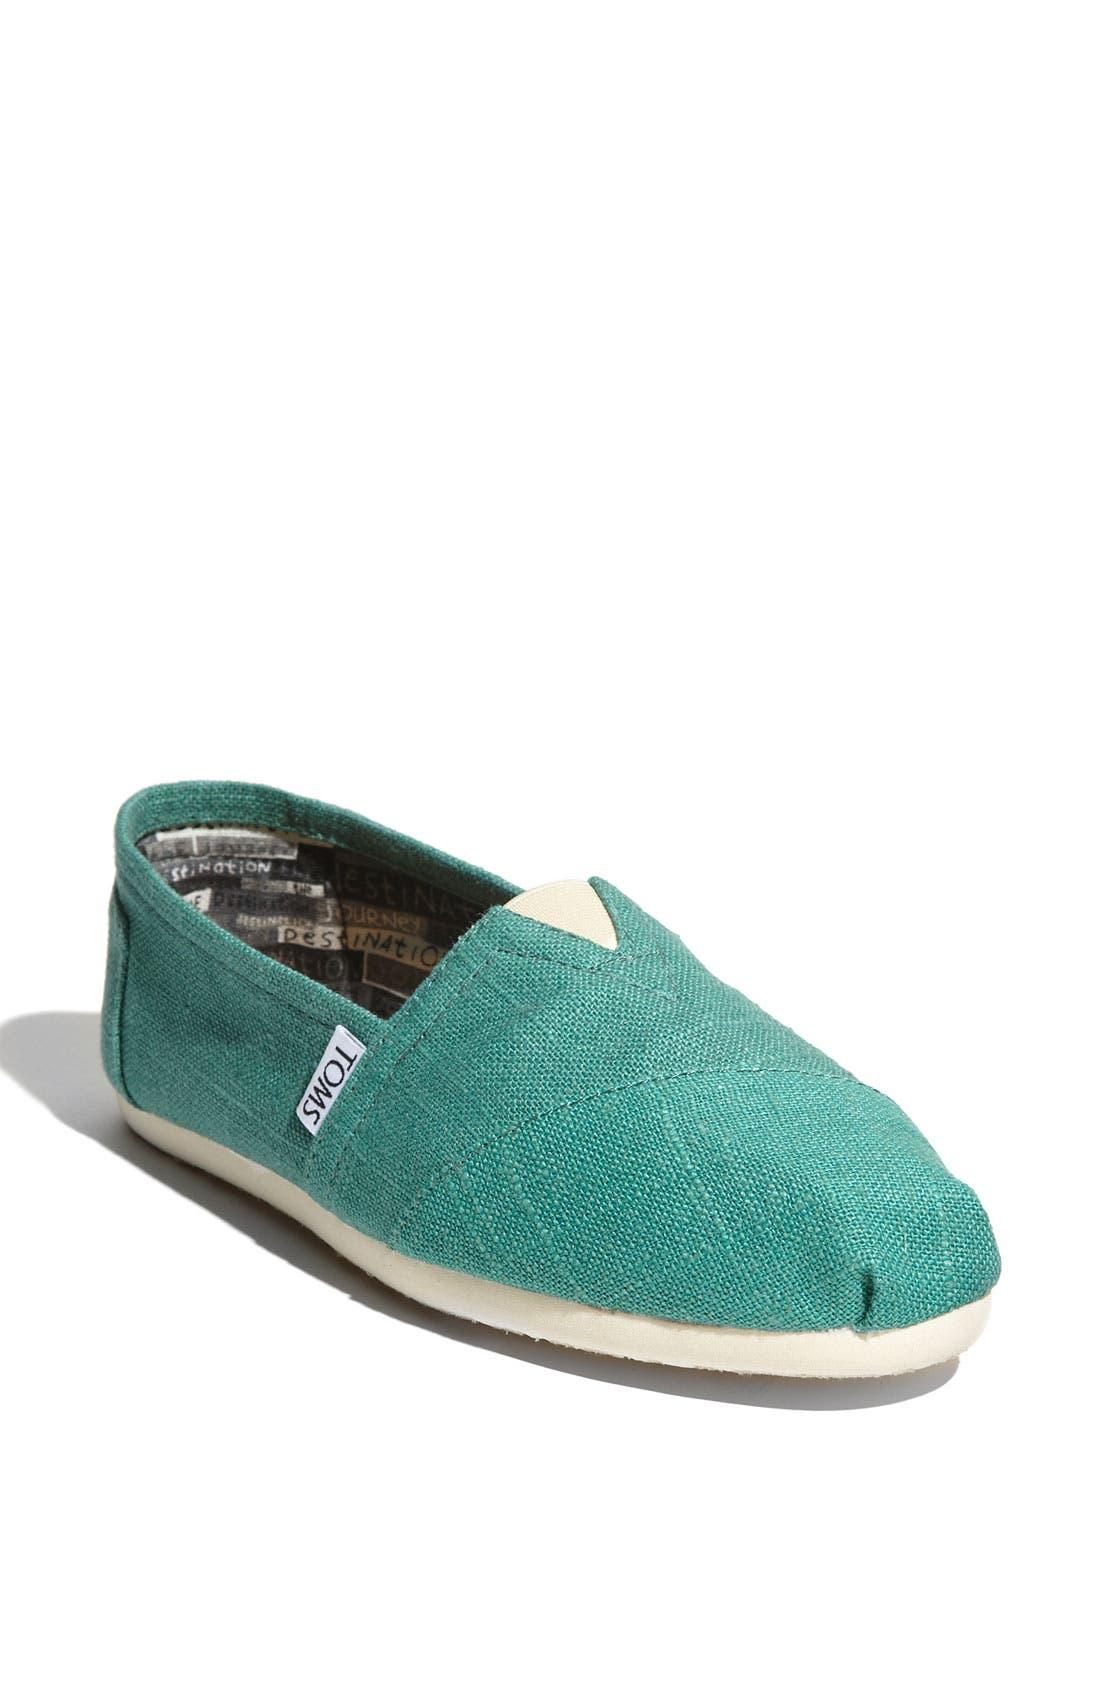 TOMS 'Classic' Linen Slip-On, Main, color, 330